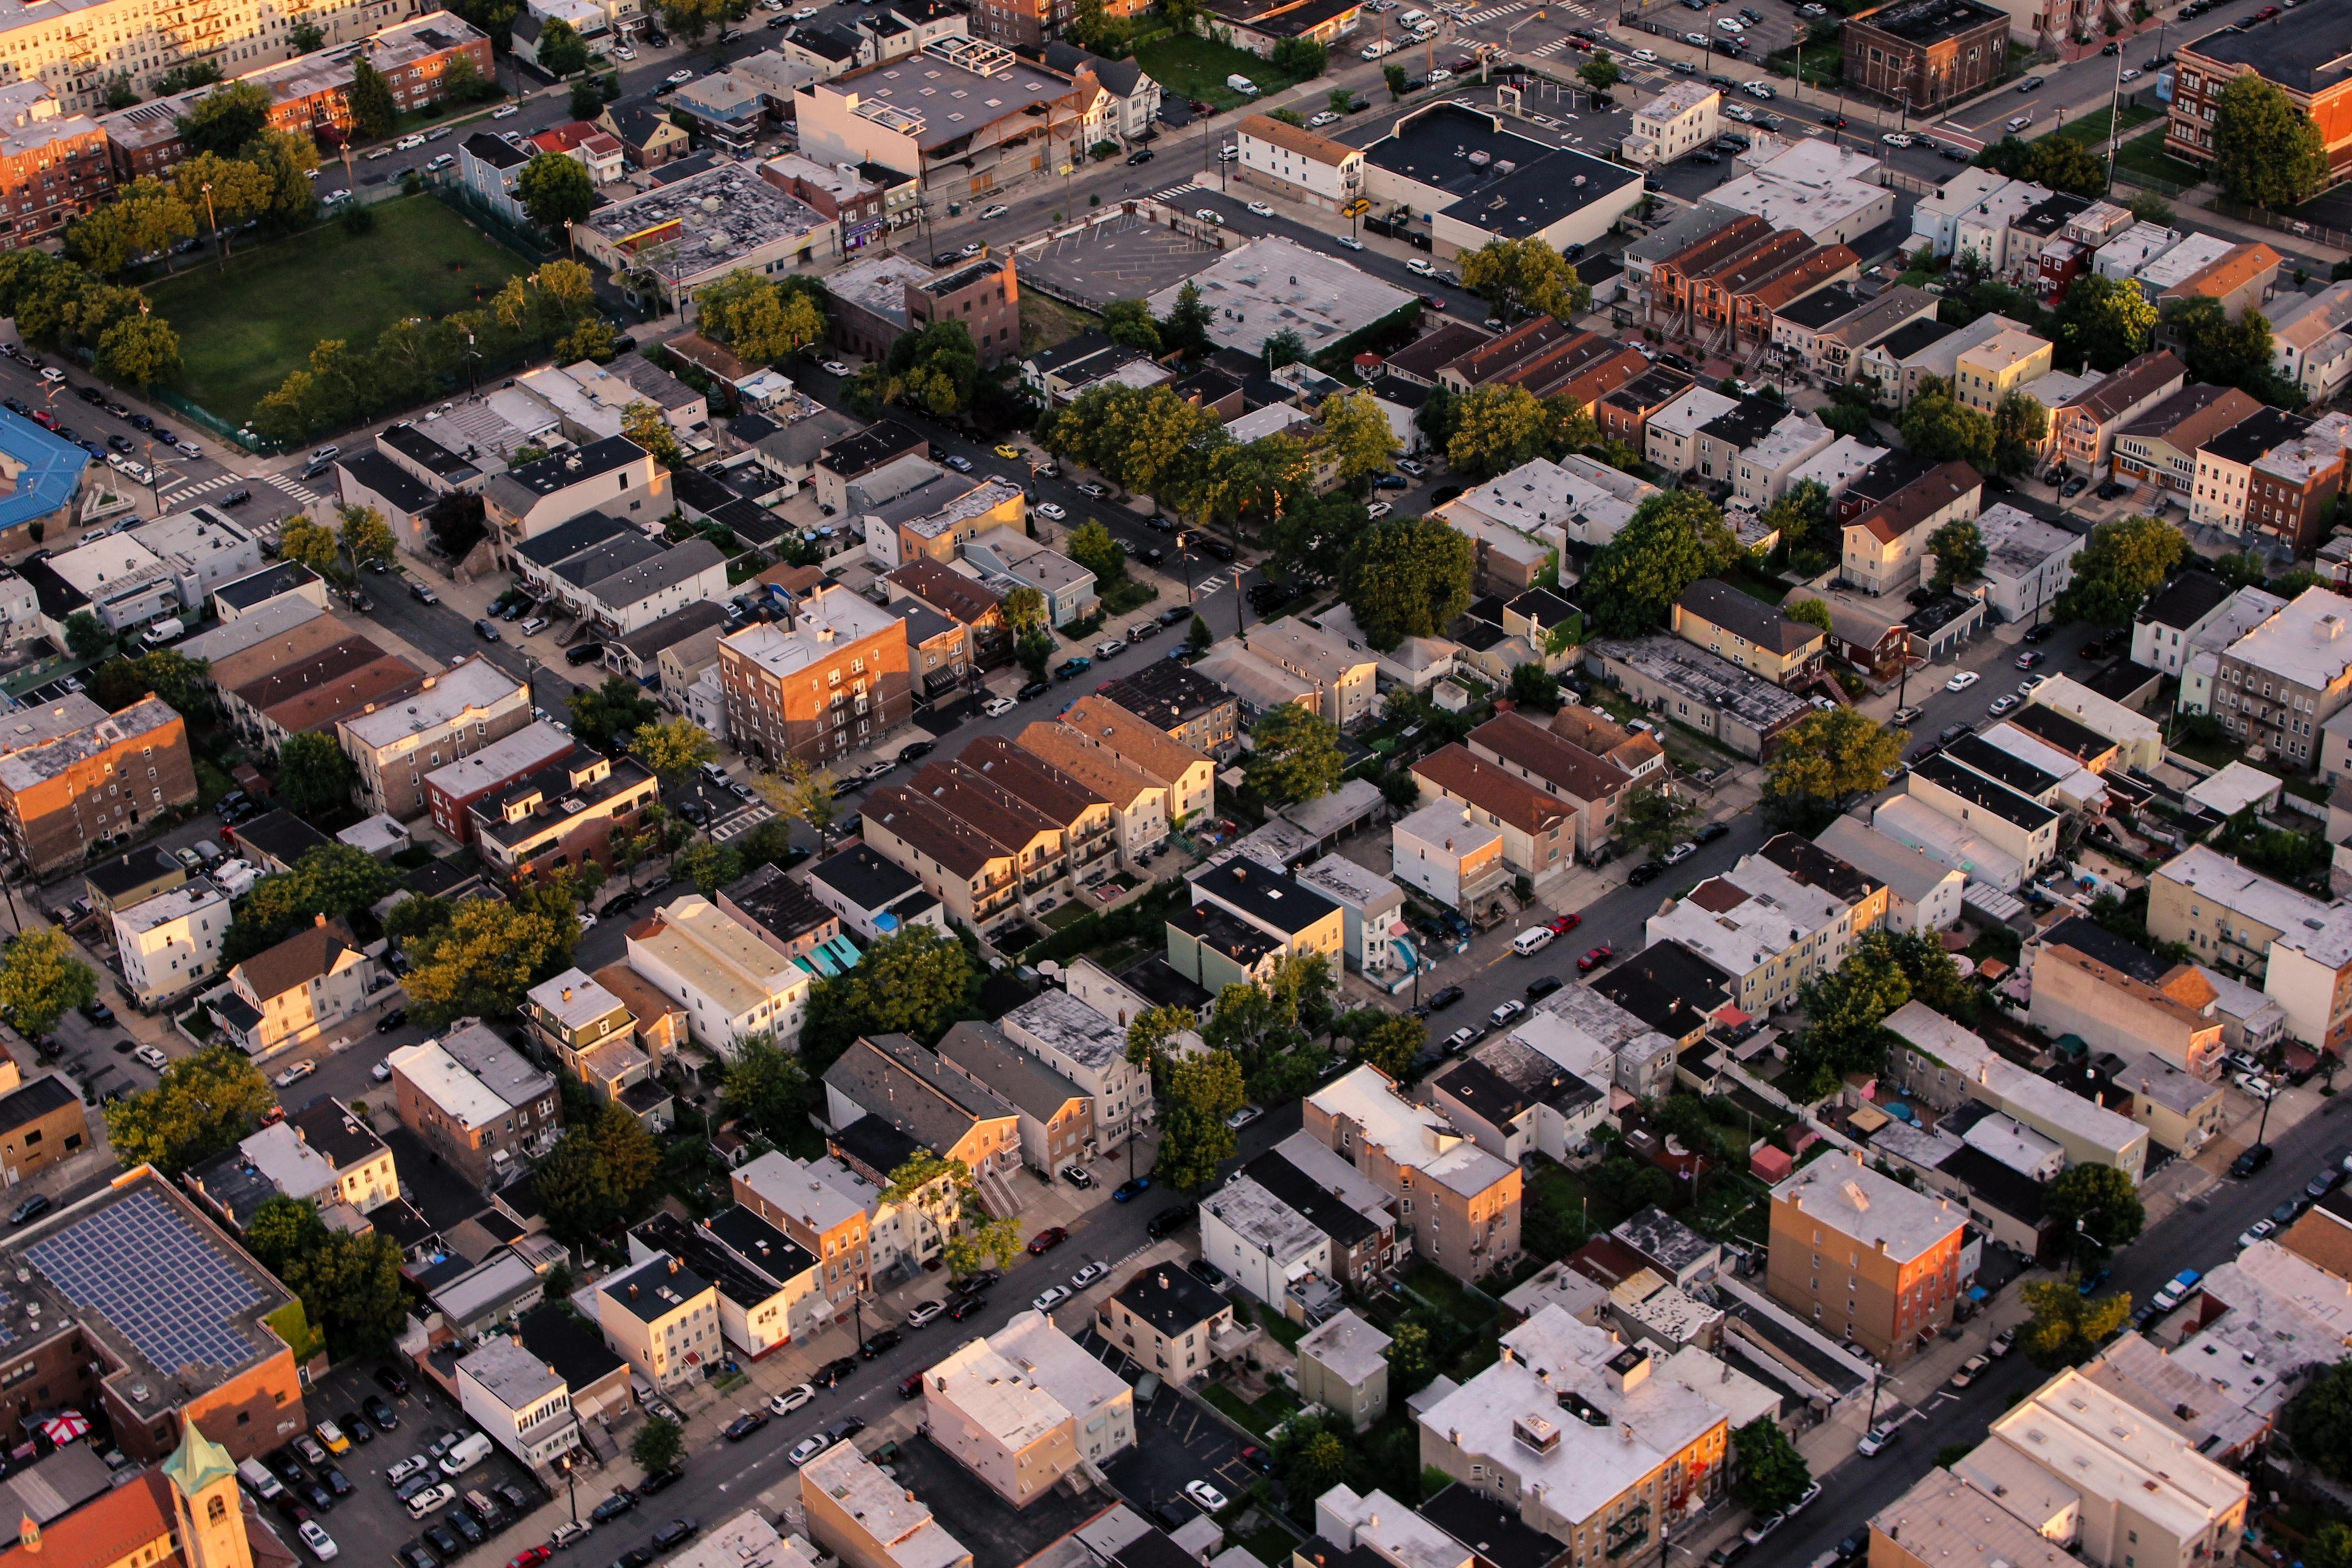 birds eye aerial view of houses